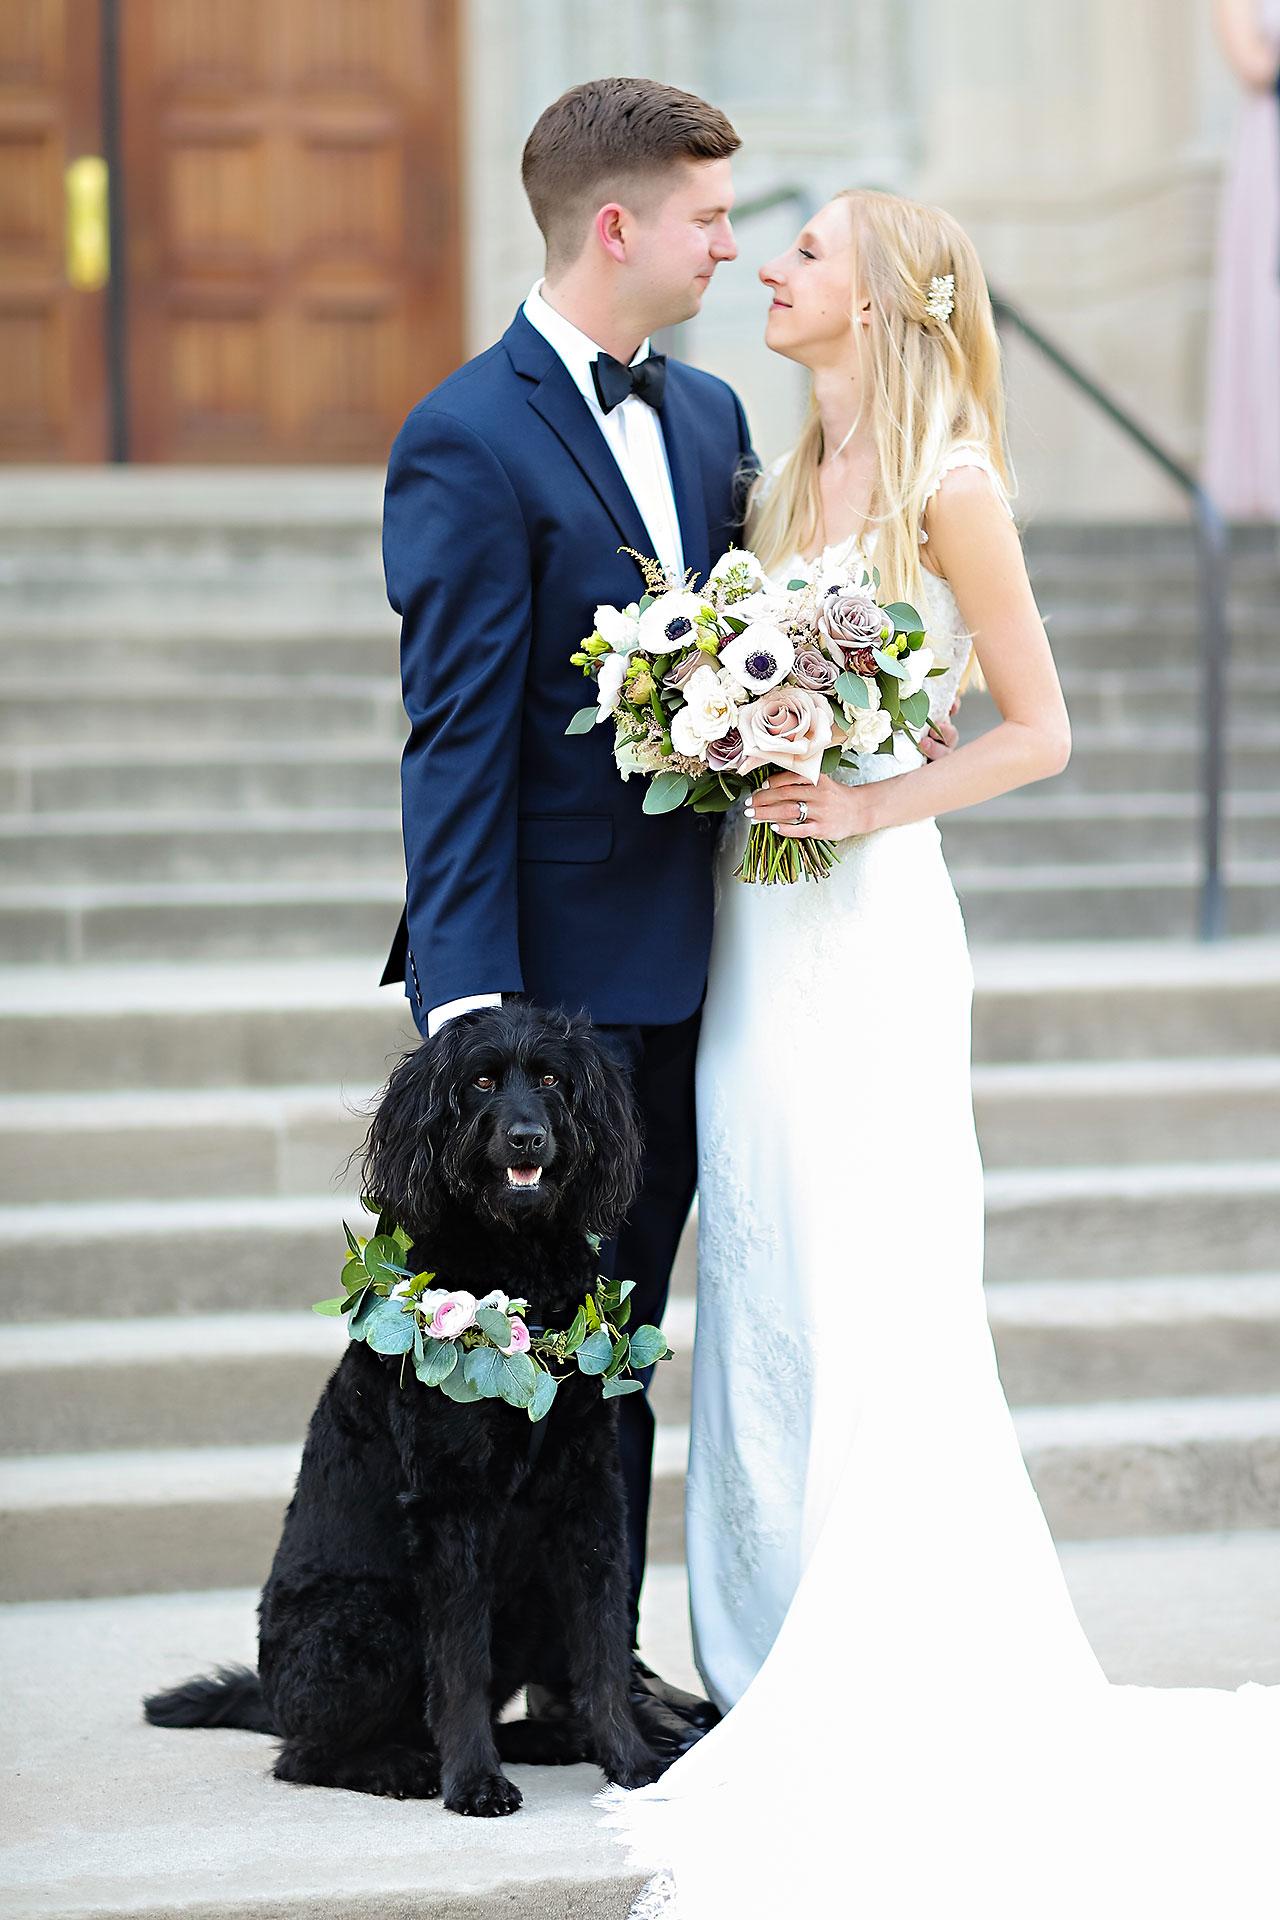 Molly Declan Scottish Rite Indianapolis Wedding 173